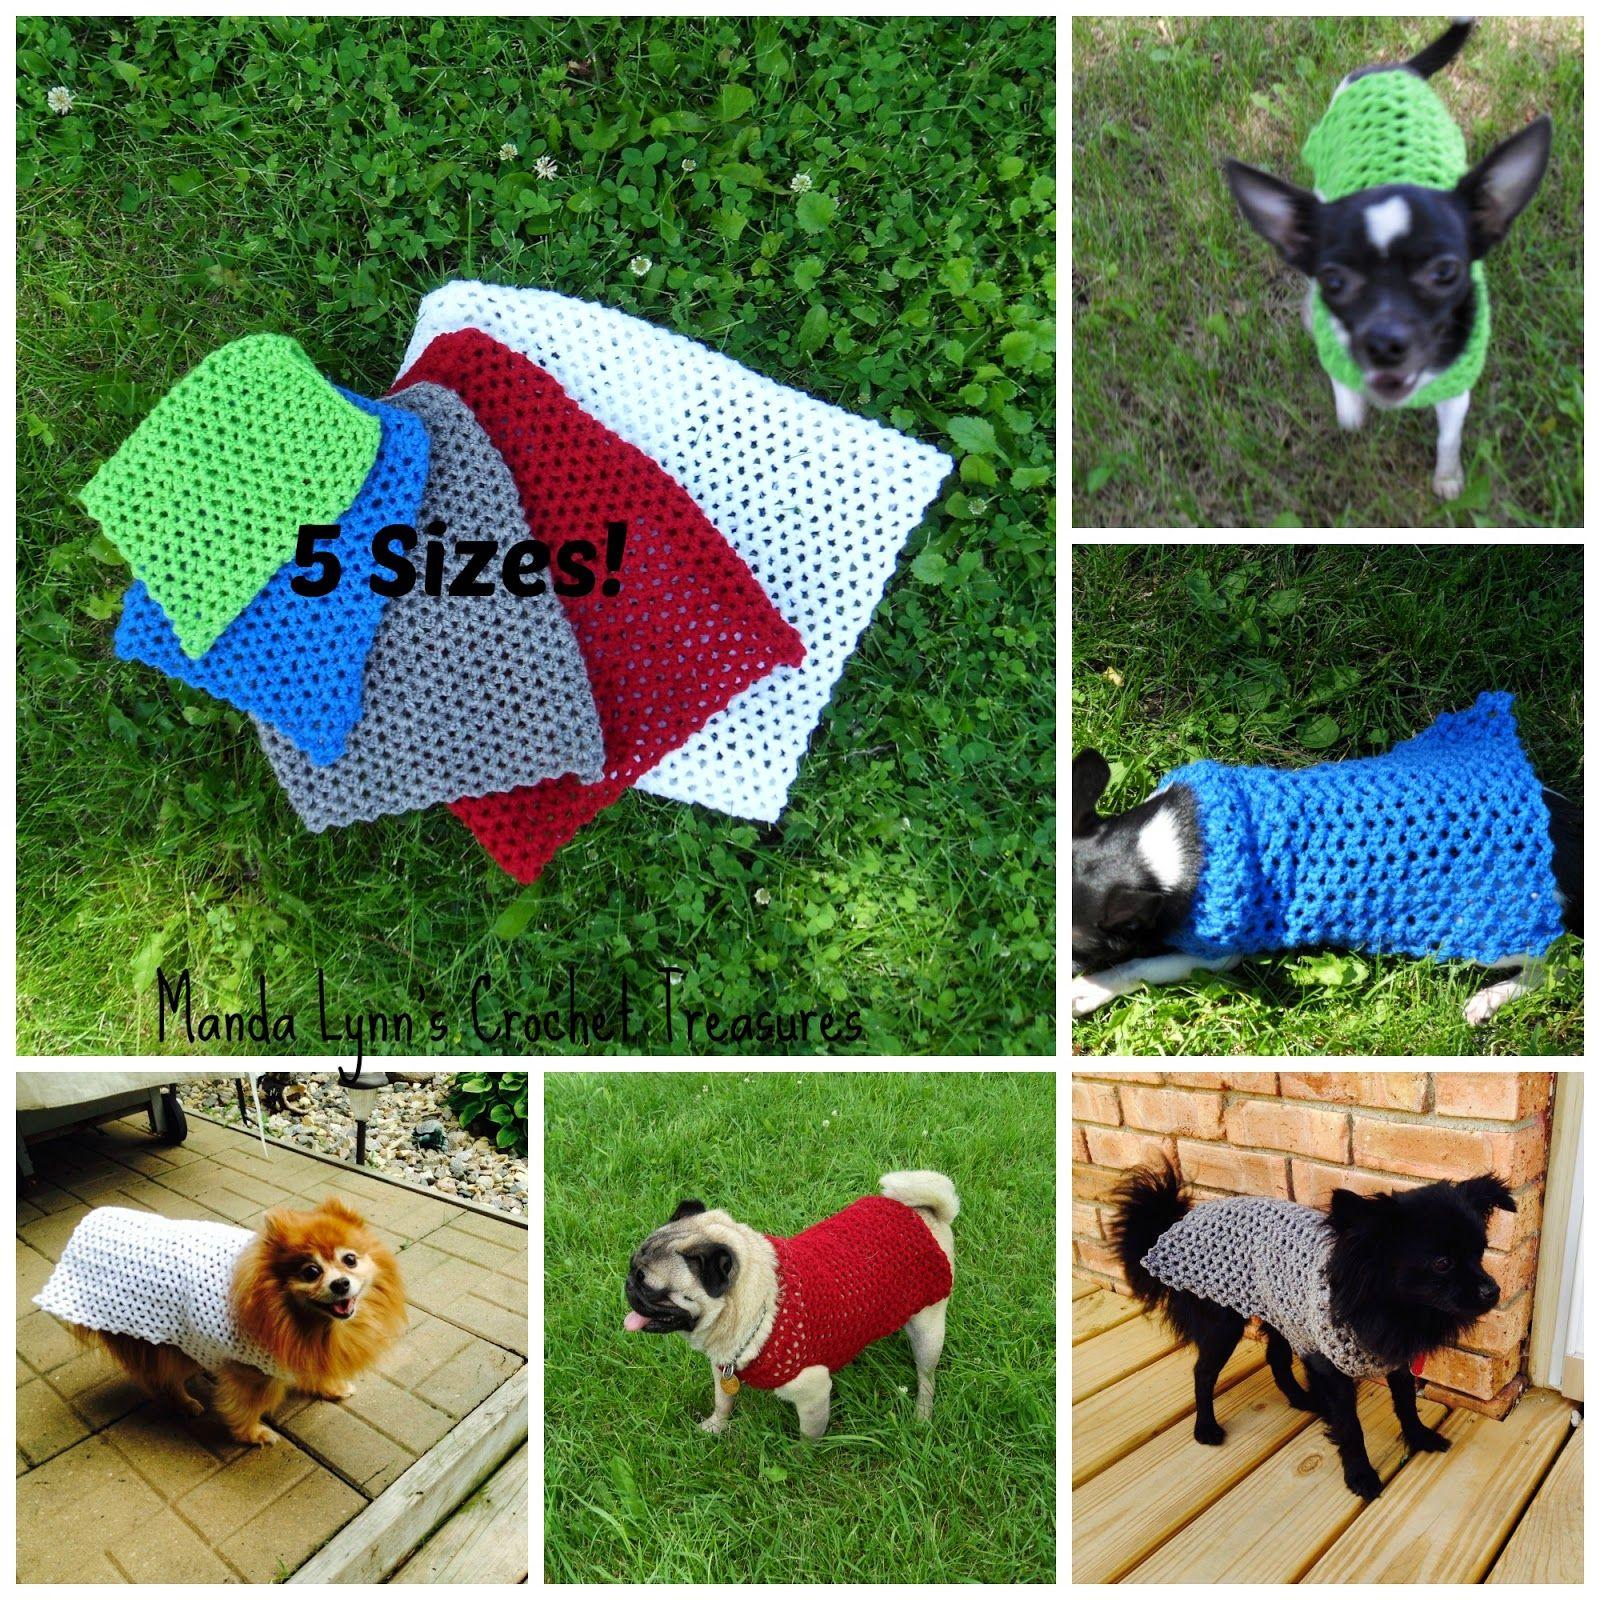 MandaLynn\'s Crochet Treasures : Crochet Any Occasion Dog Sweater 5 ...